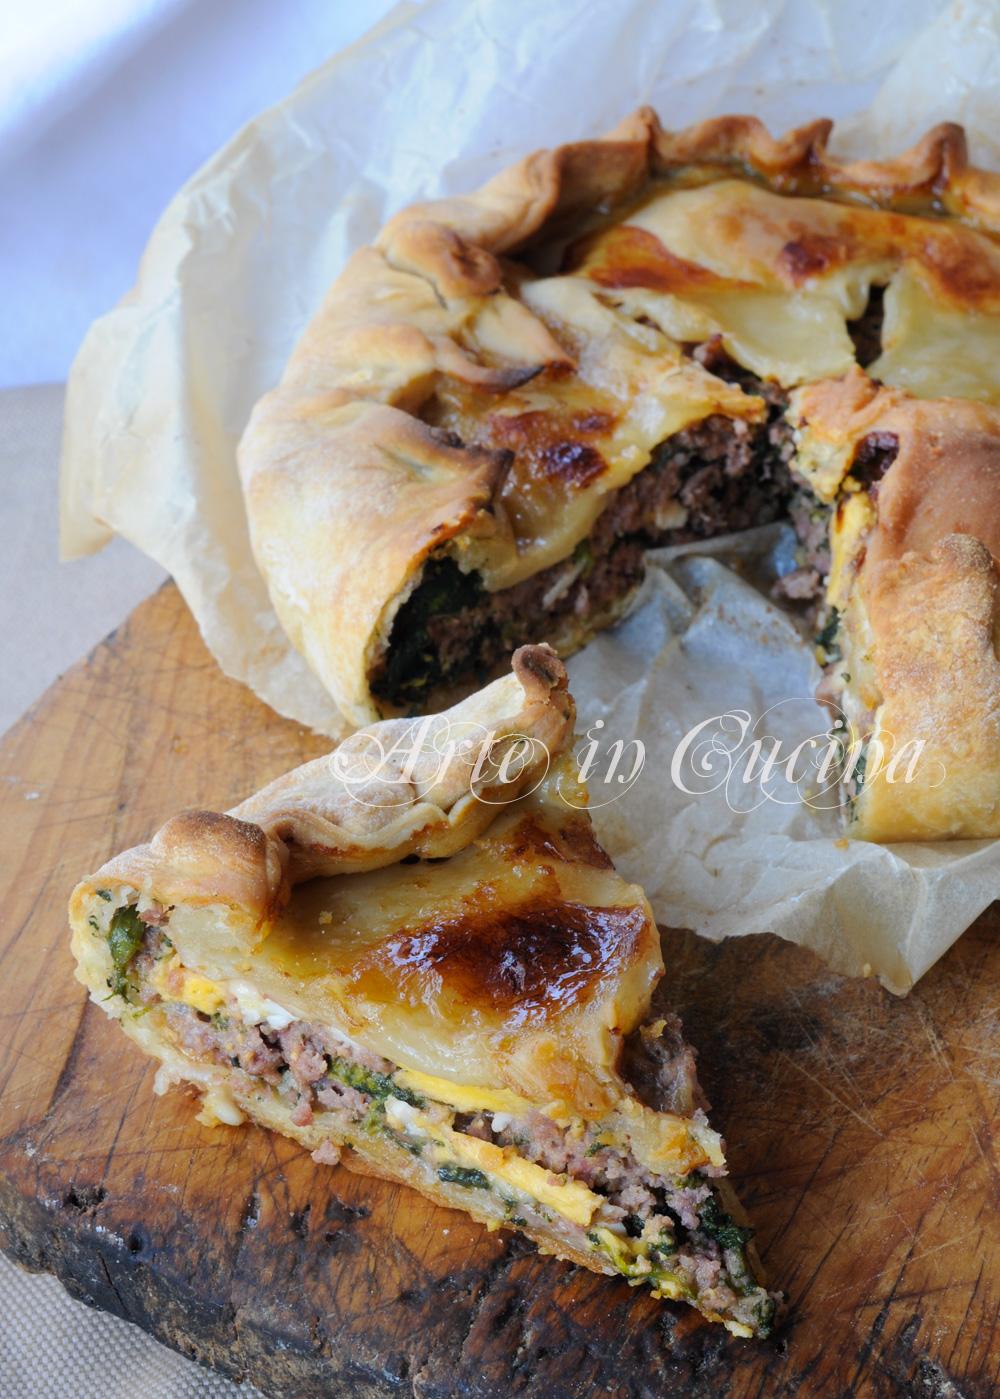 Torta di carne e spinaci salata ricetta facile vickyart arte in cucina